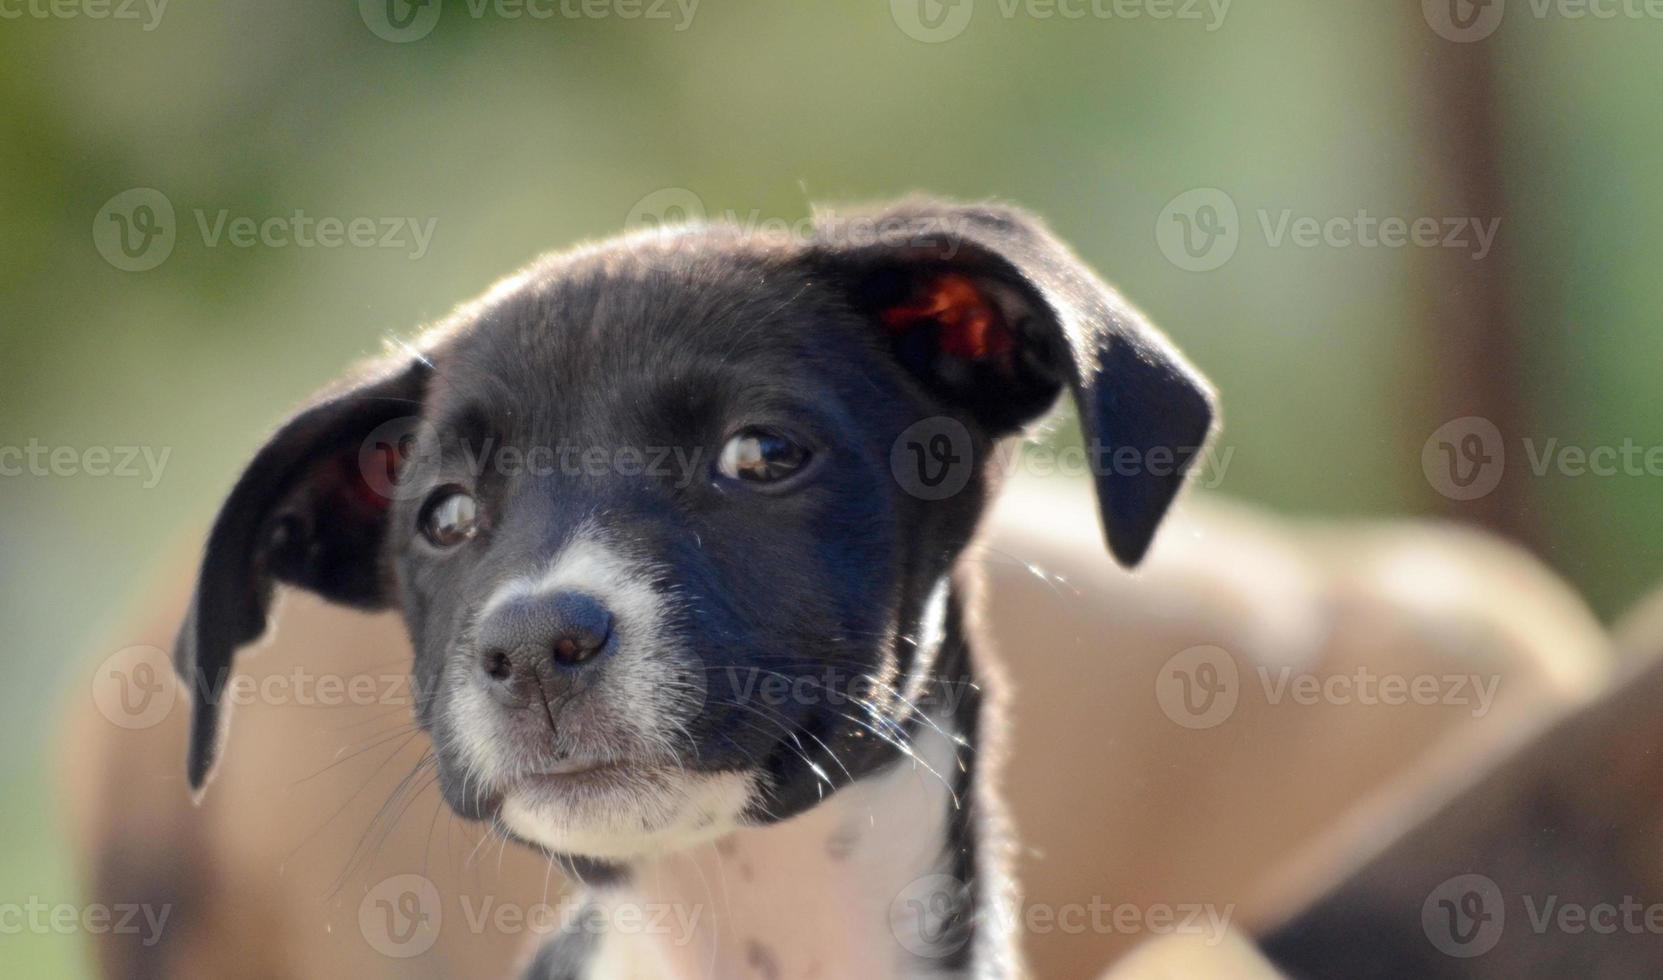 Cute Puppies of Amstaff dog, animal theme photo